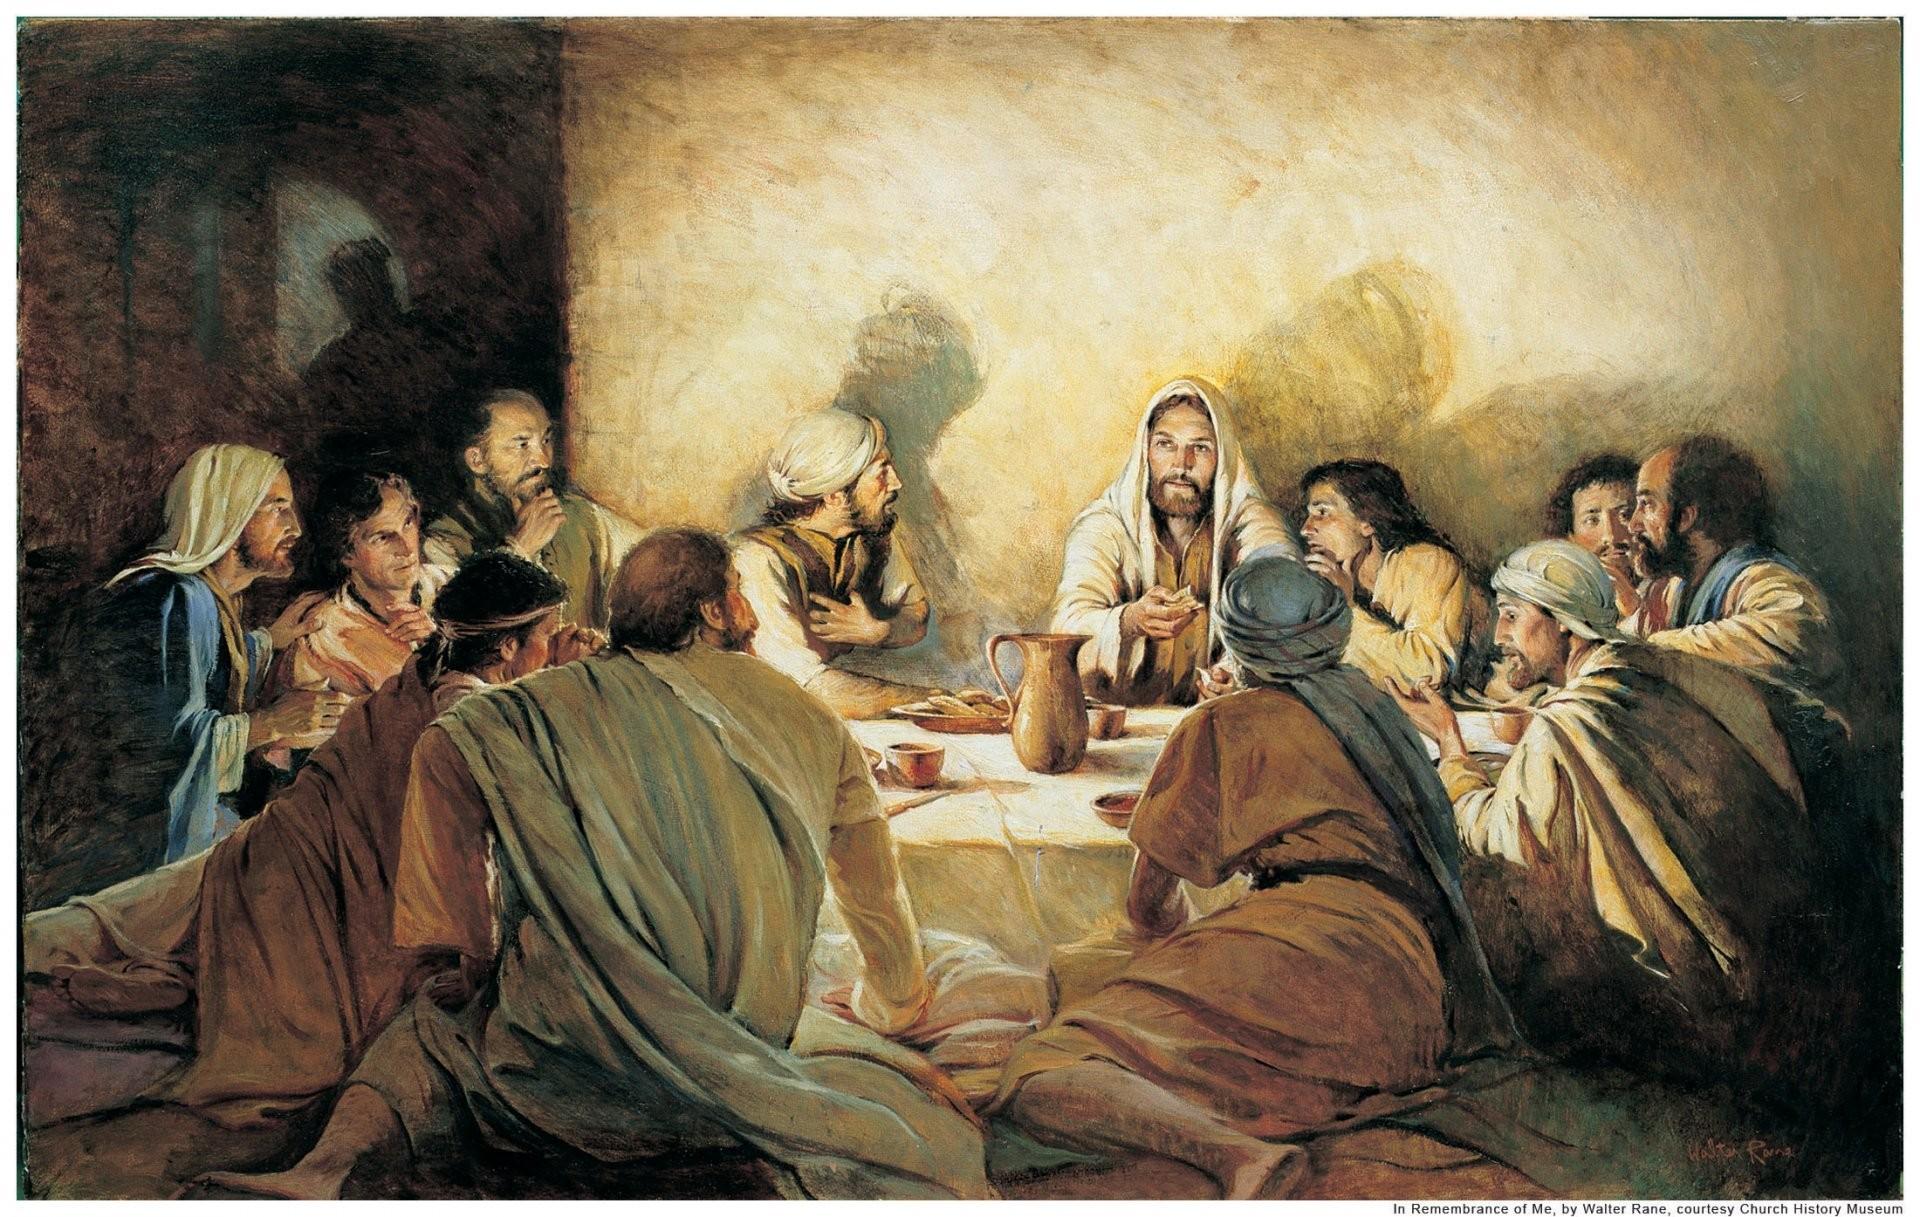 last supper jesus christ the last supper apostles find judas jesus bread  wine wall light shadow